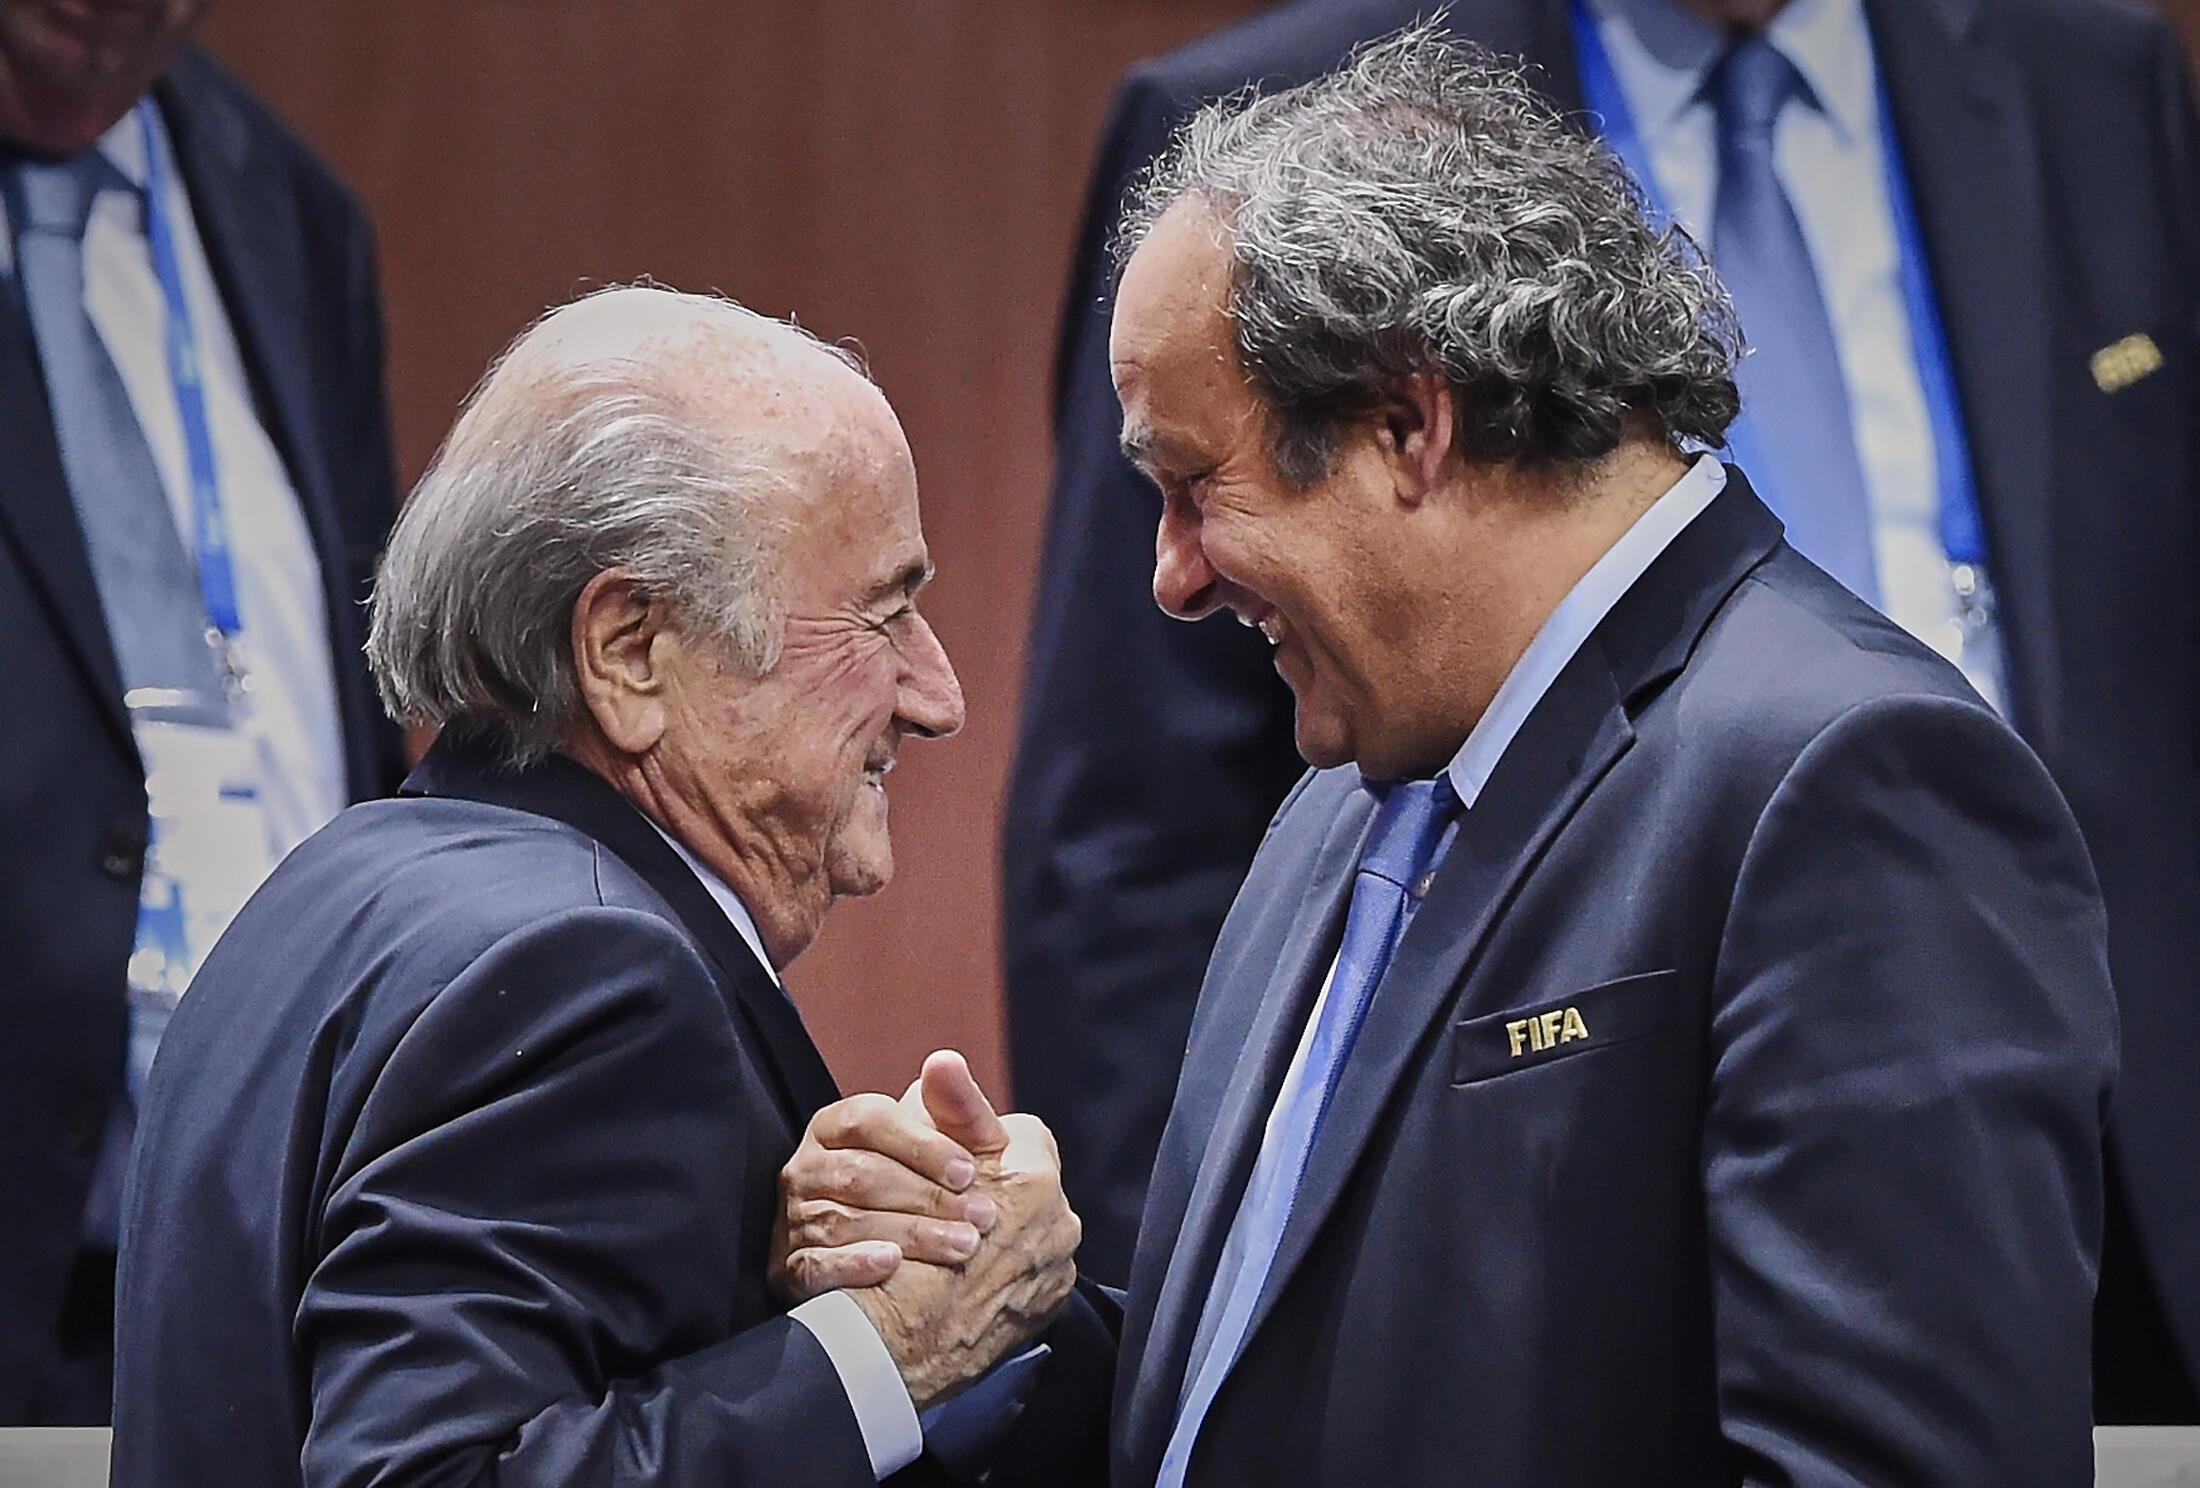 Sepp Blatter and Michel Platini in June 2015.